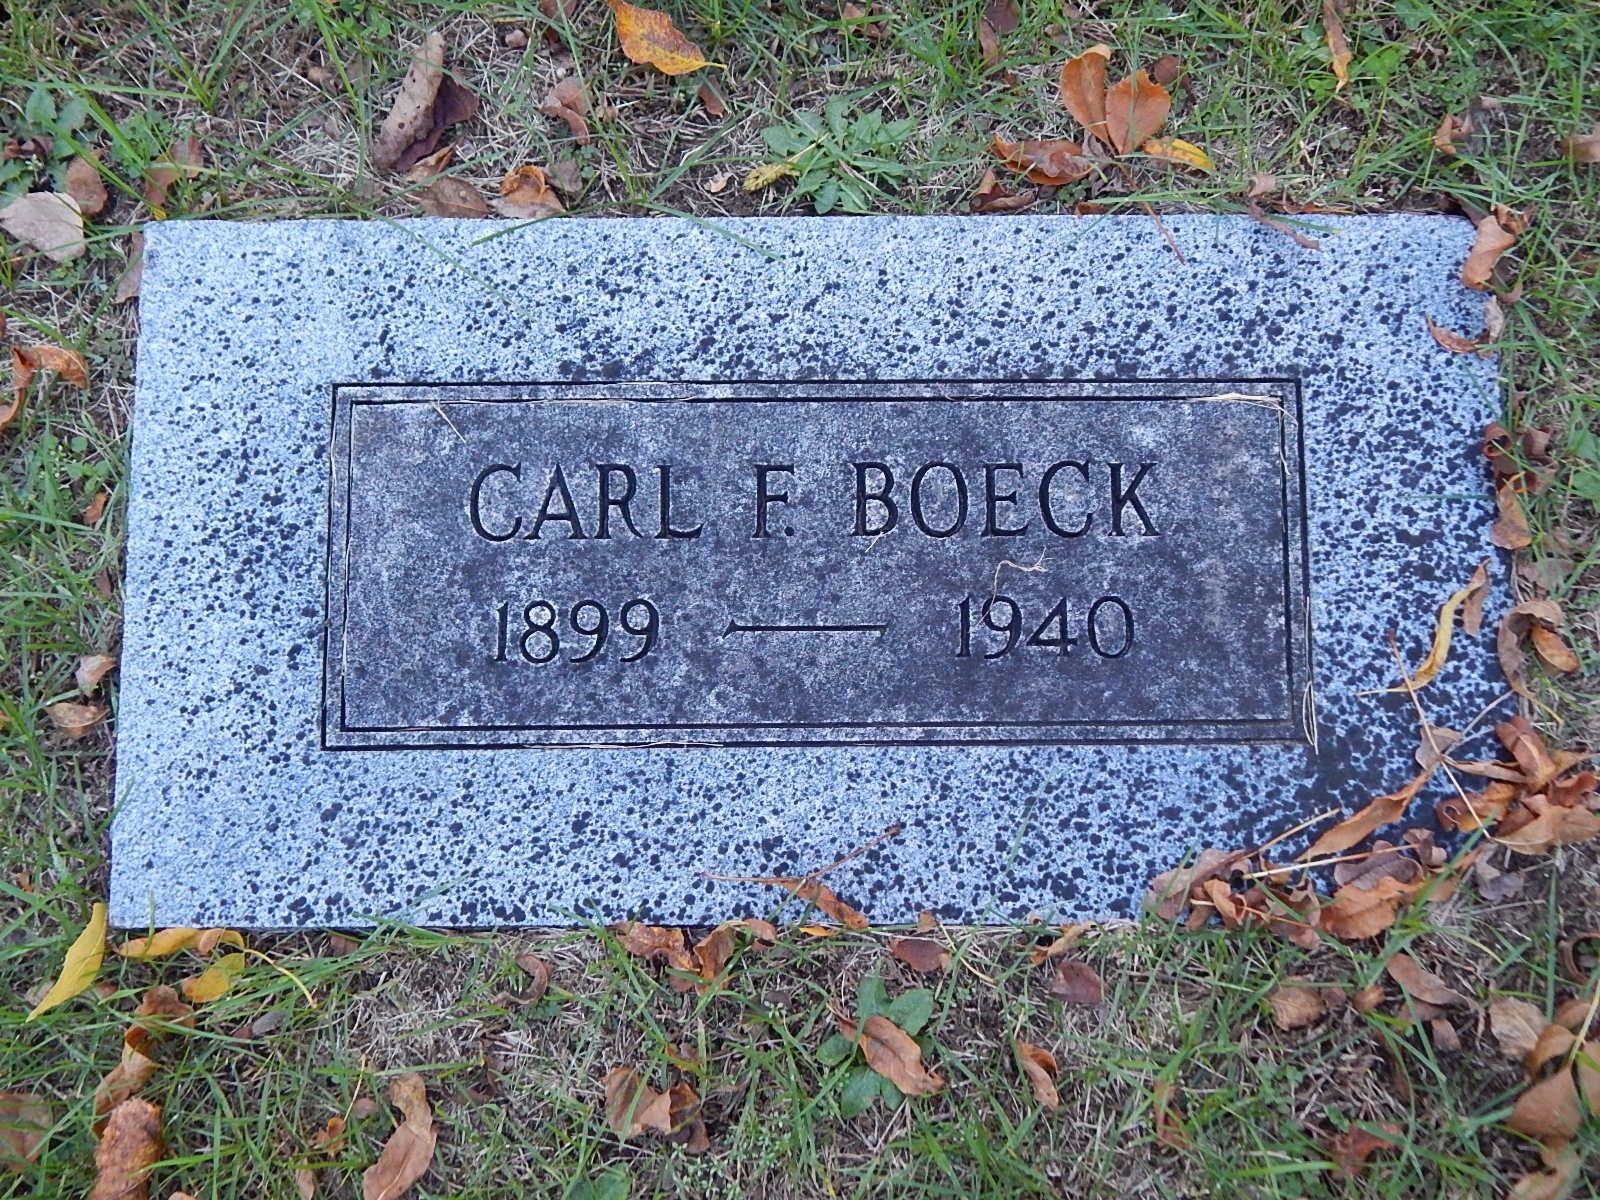 Carl F. Boeck